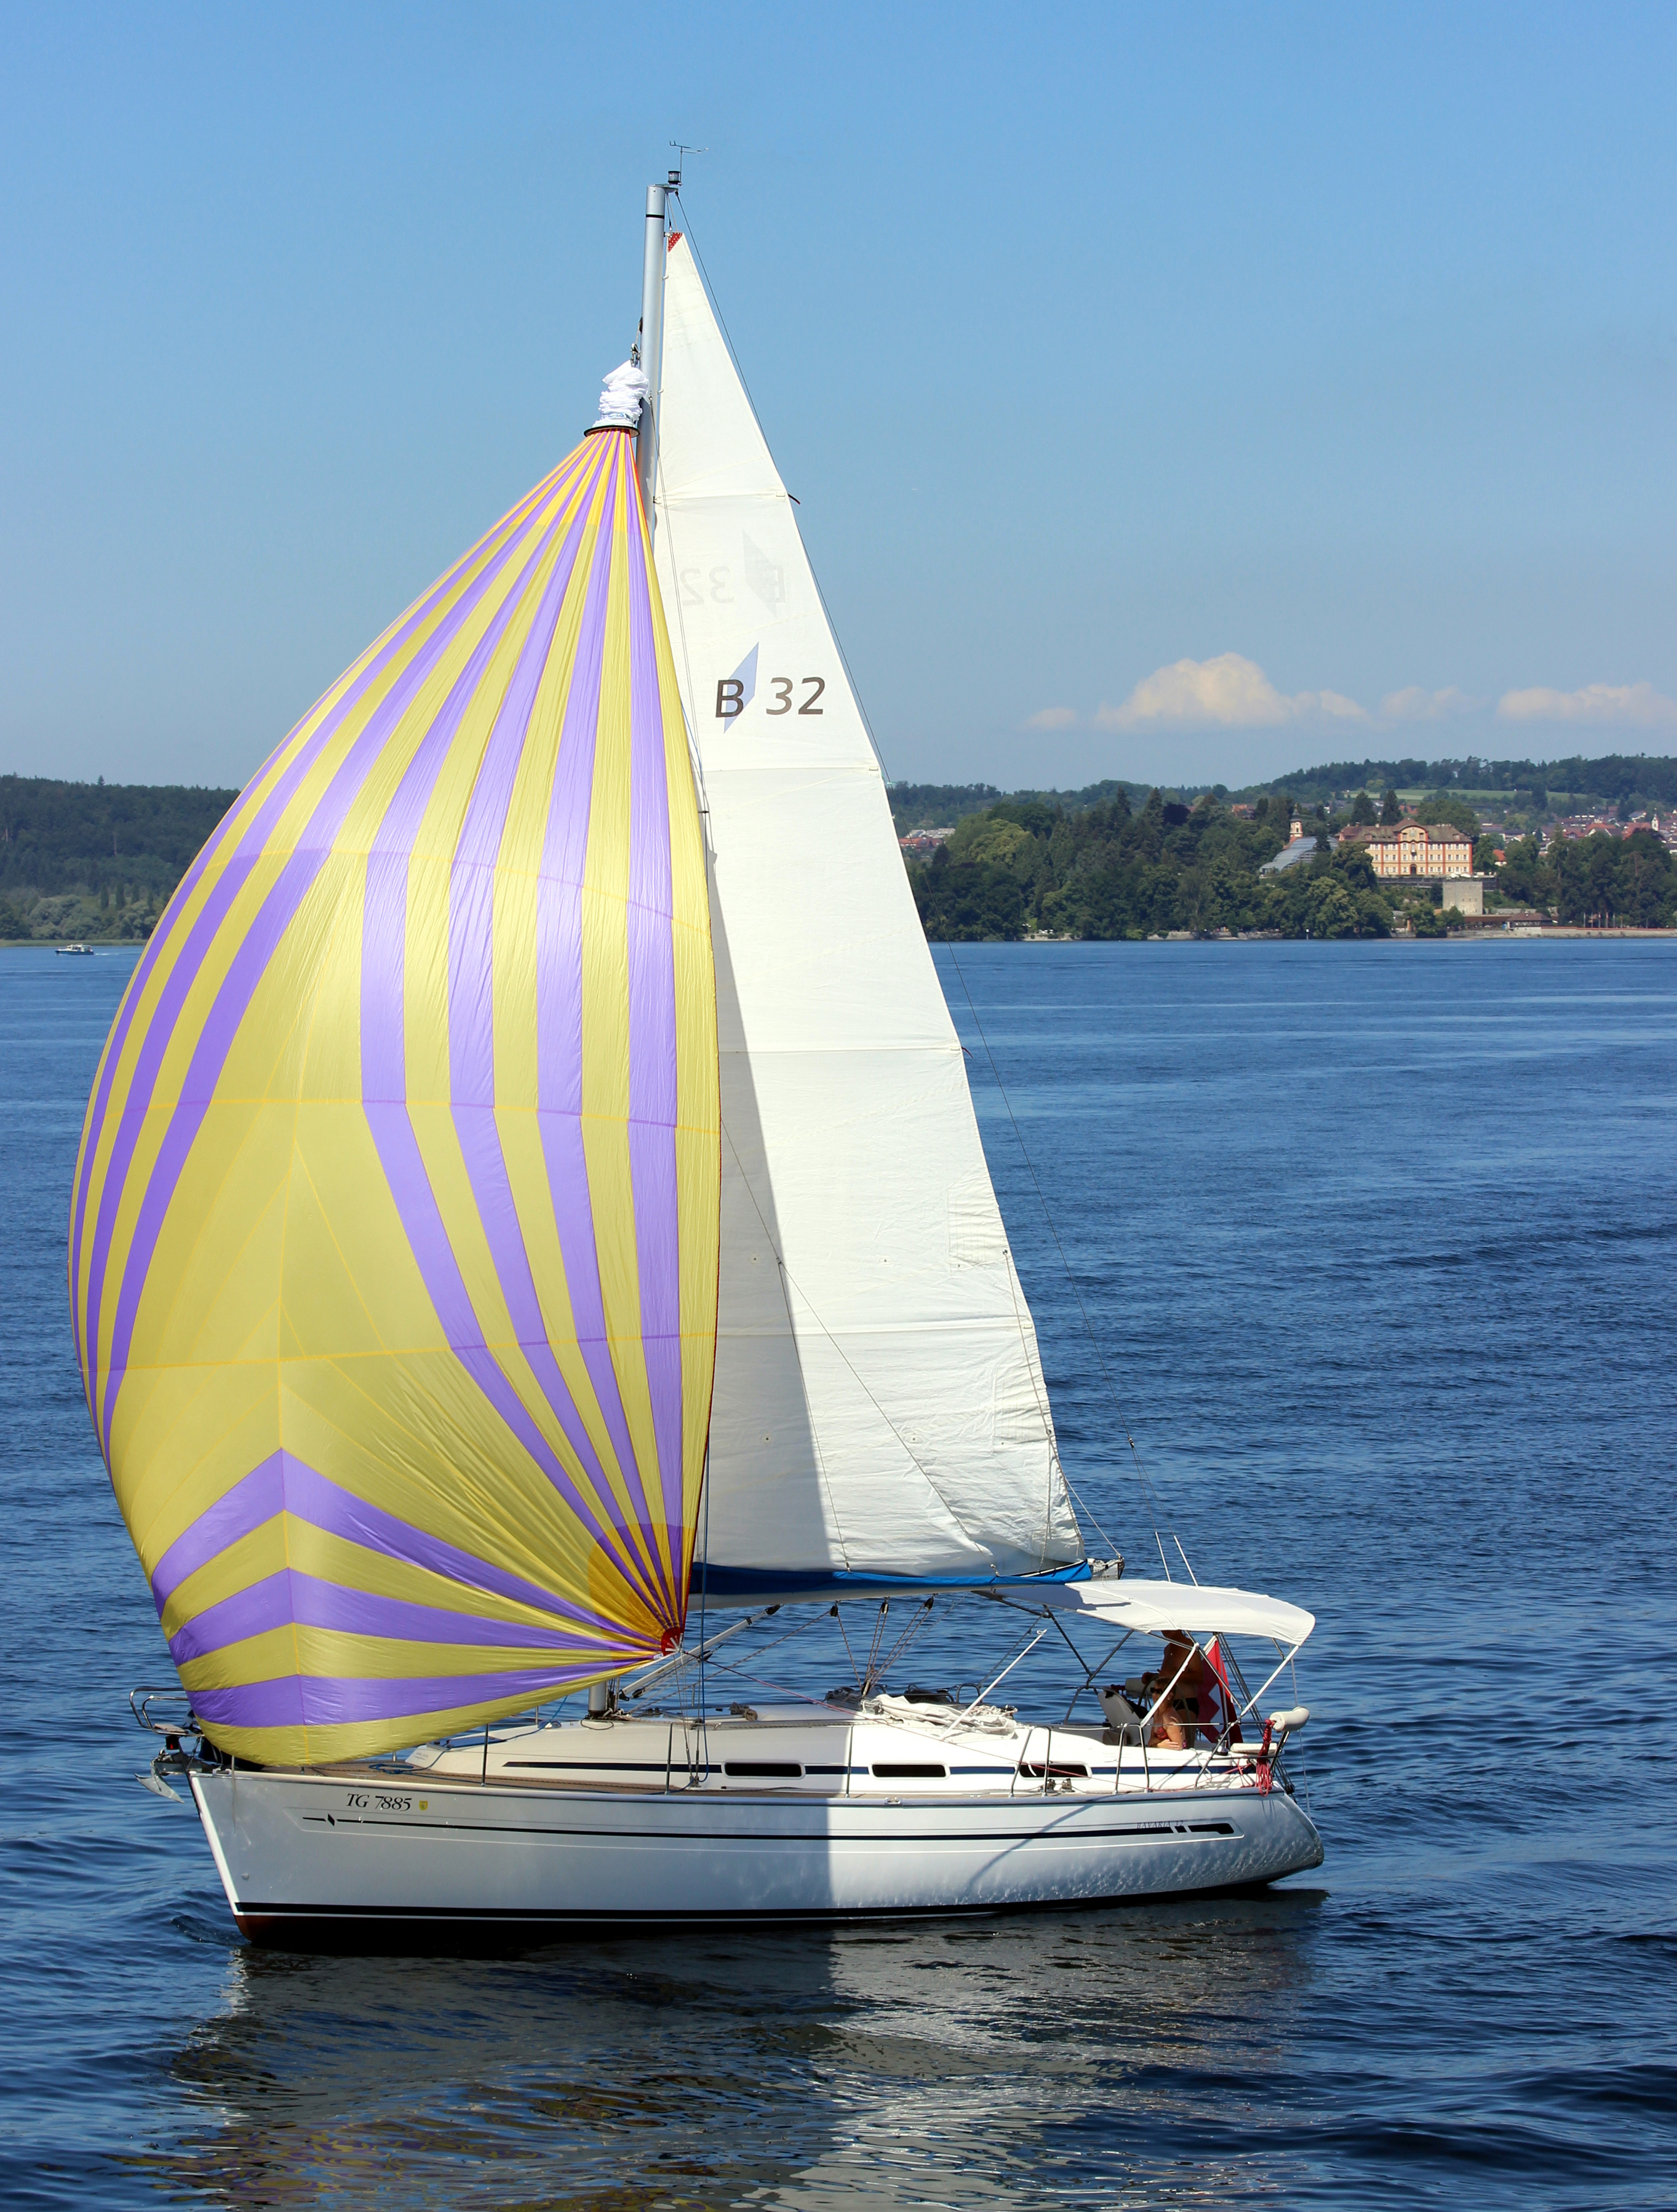 Segelboot_Bodensee_Mainau_(Foto_Hilarmont).JPG (2726×3596)